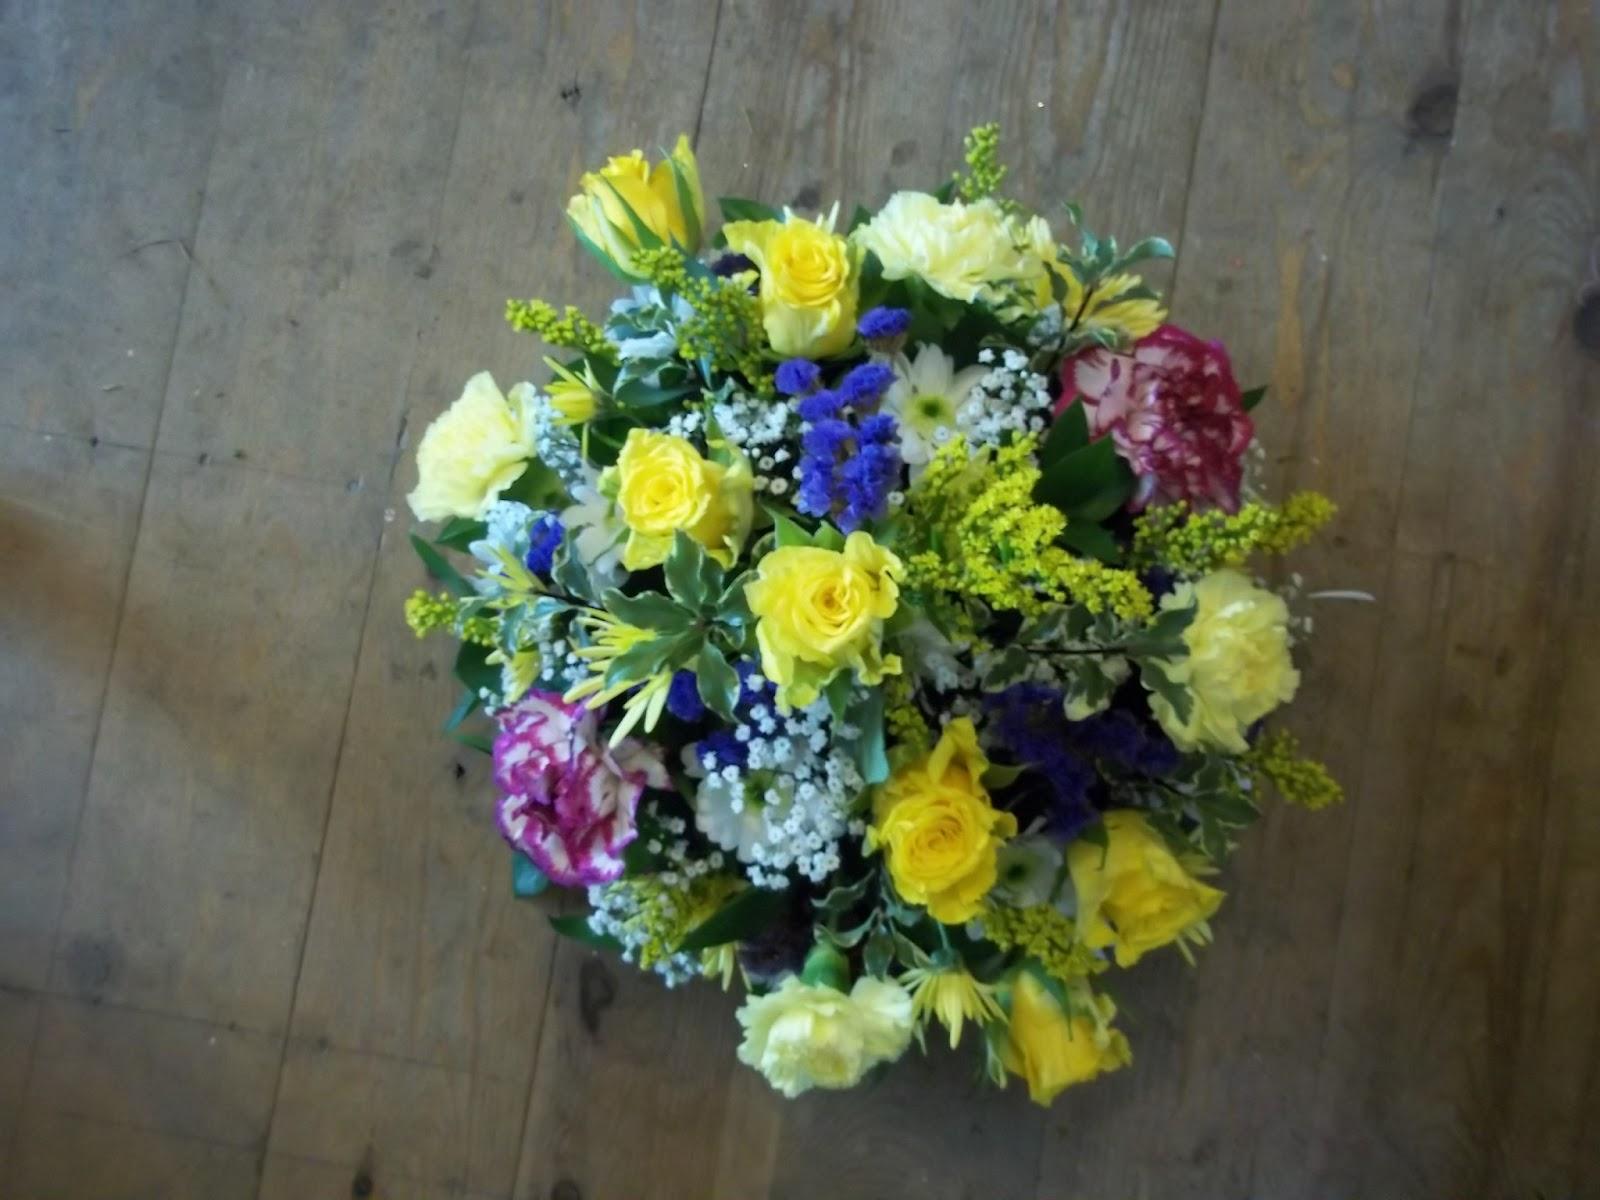 Snapdragons Florist Burgh Le Marsh Lincolnshire Funerals